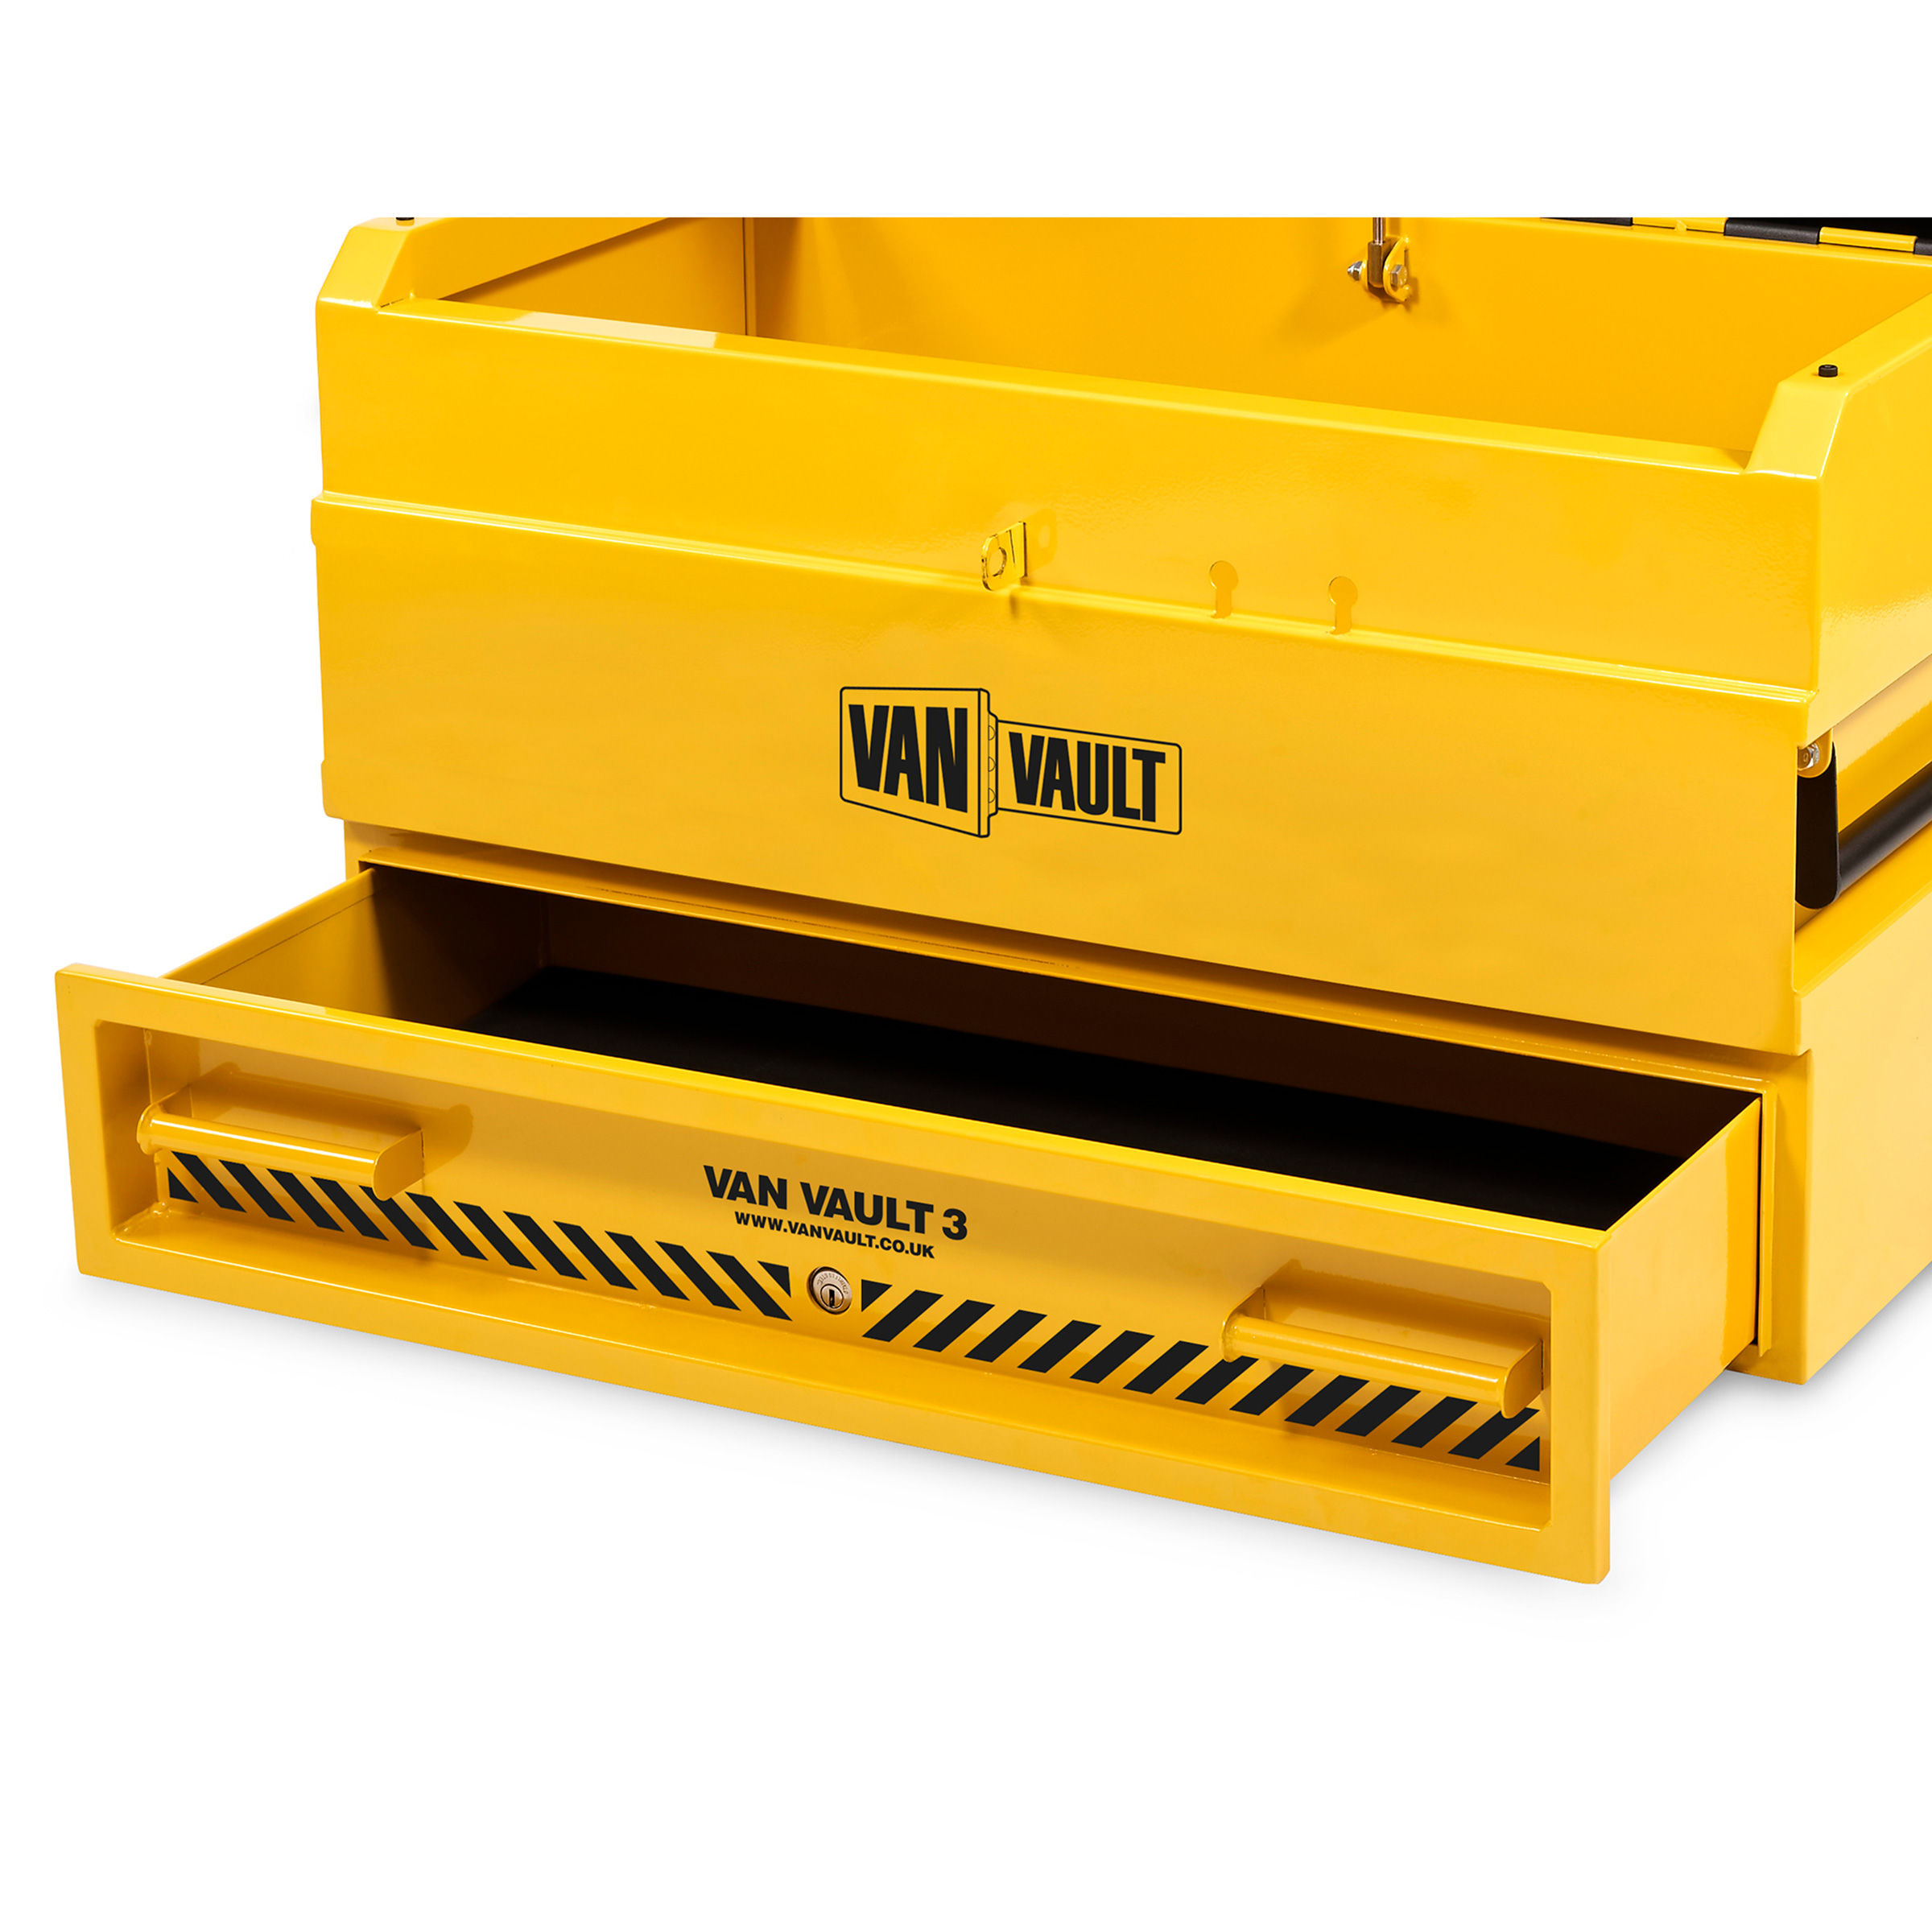 2cb53dcc95a396 Van Vault 3 Site High Security Steel Storage Box S10345 (922 x 566 x 490mm